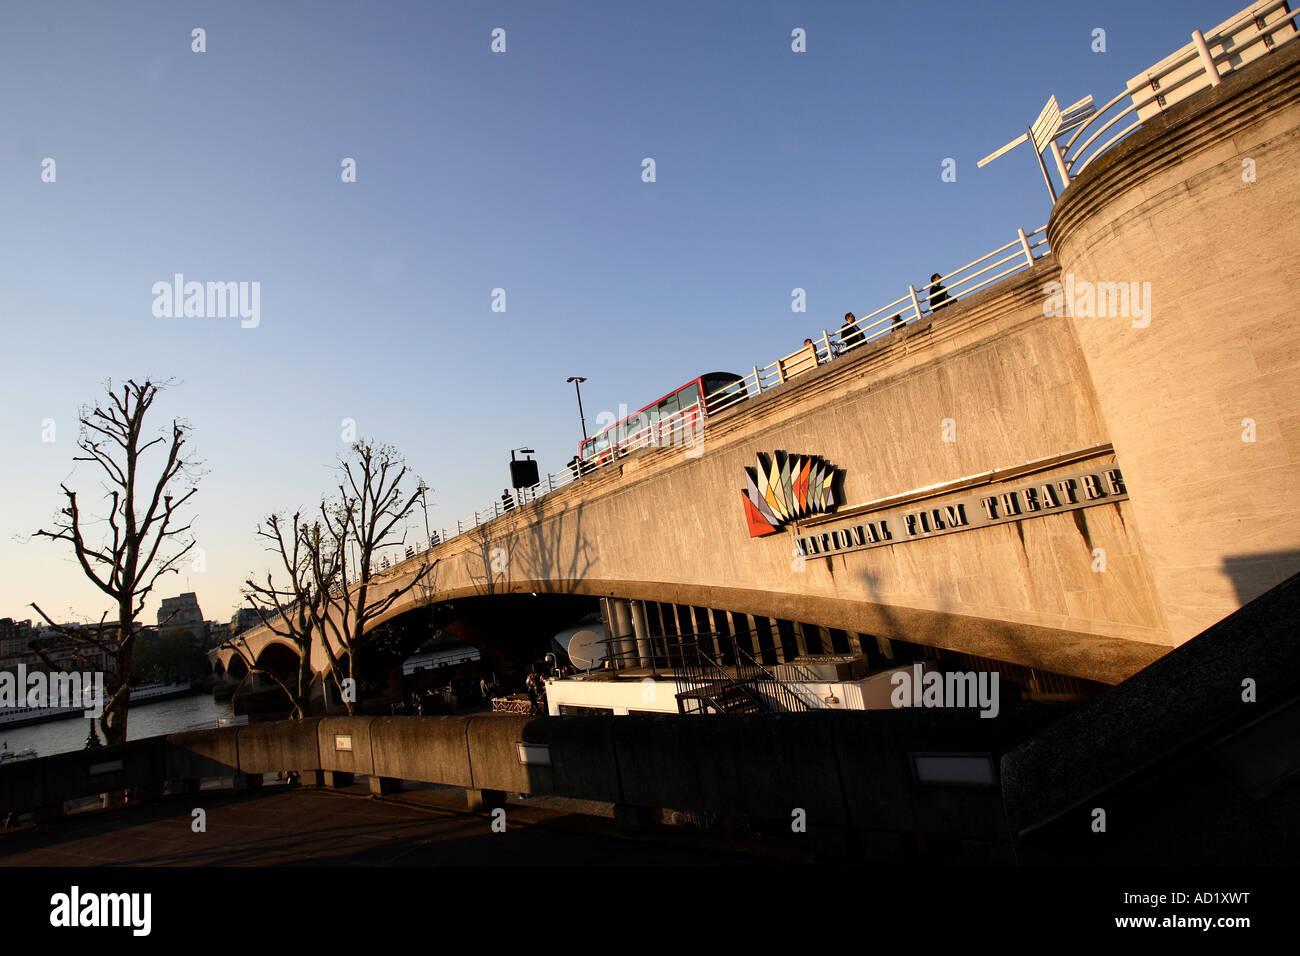 National Film Theatre sign on Waterloo Bridge. South Bank, London, England, UK - Stock Image